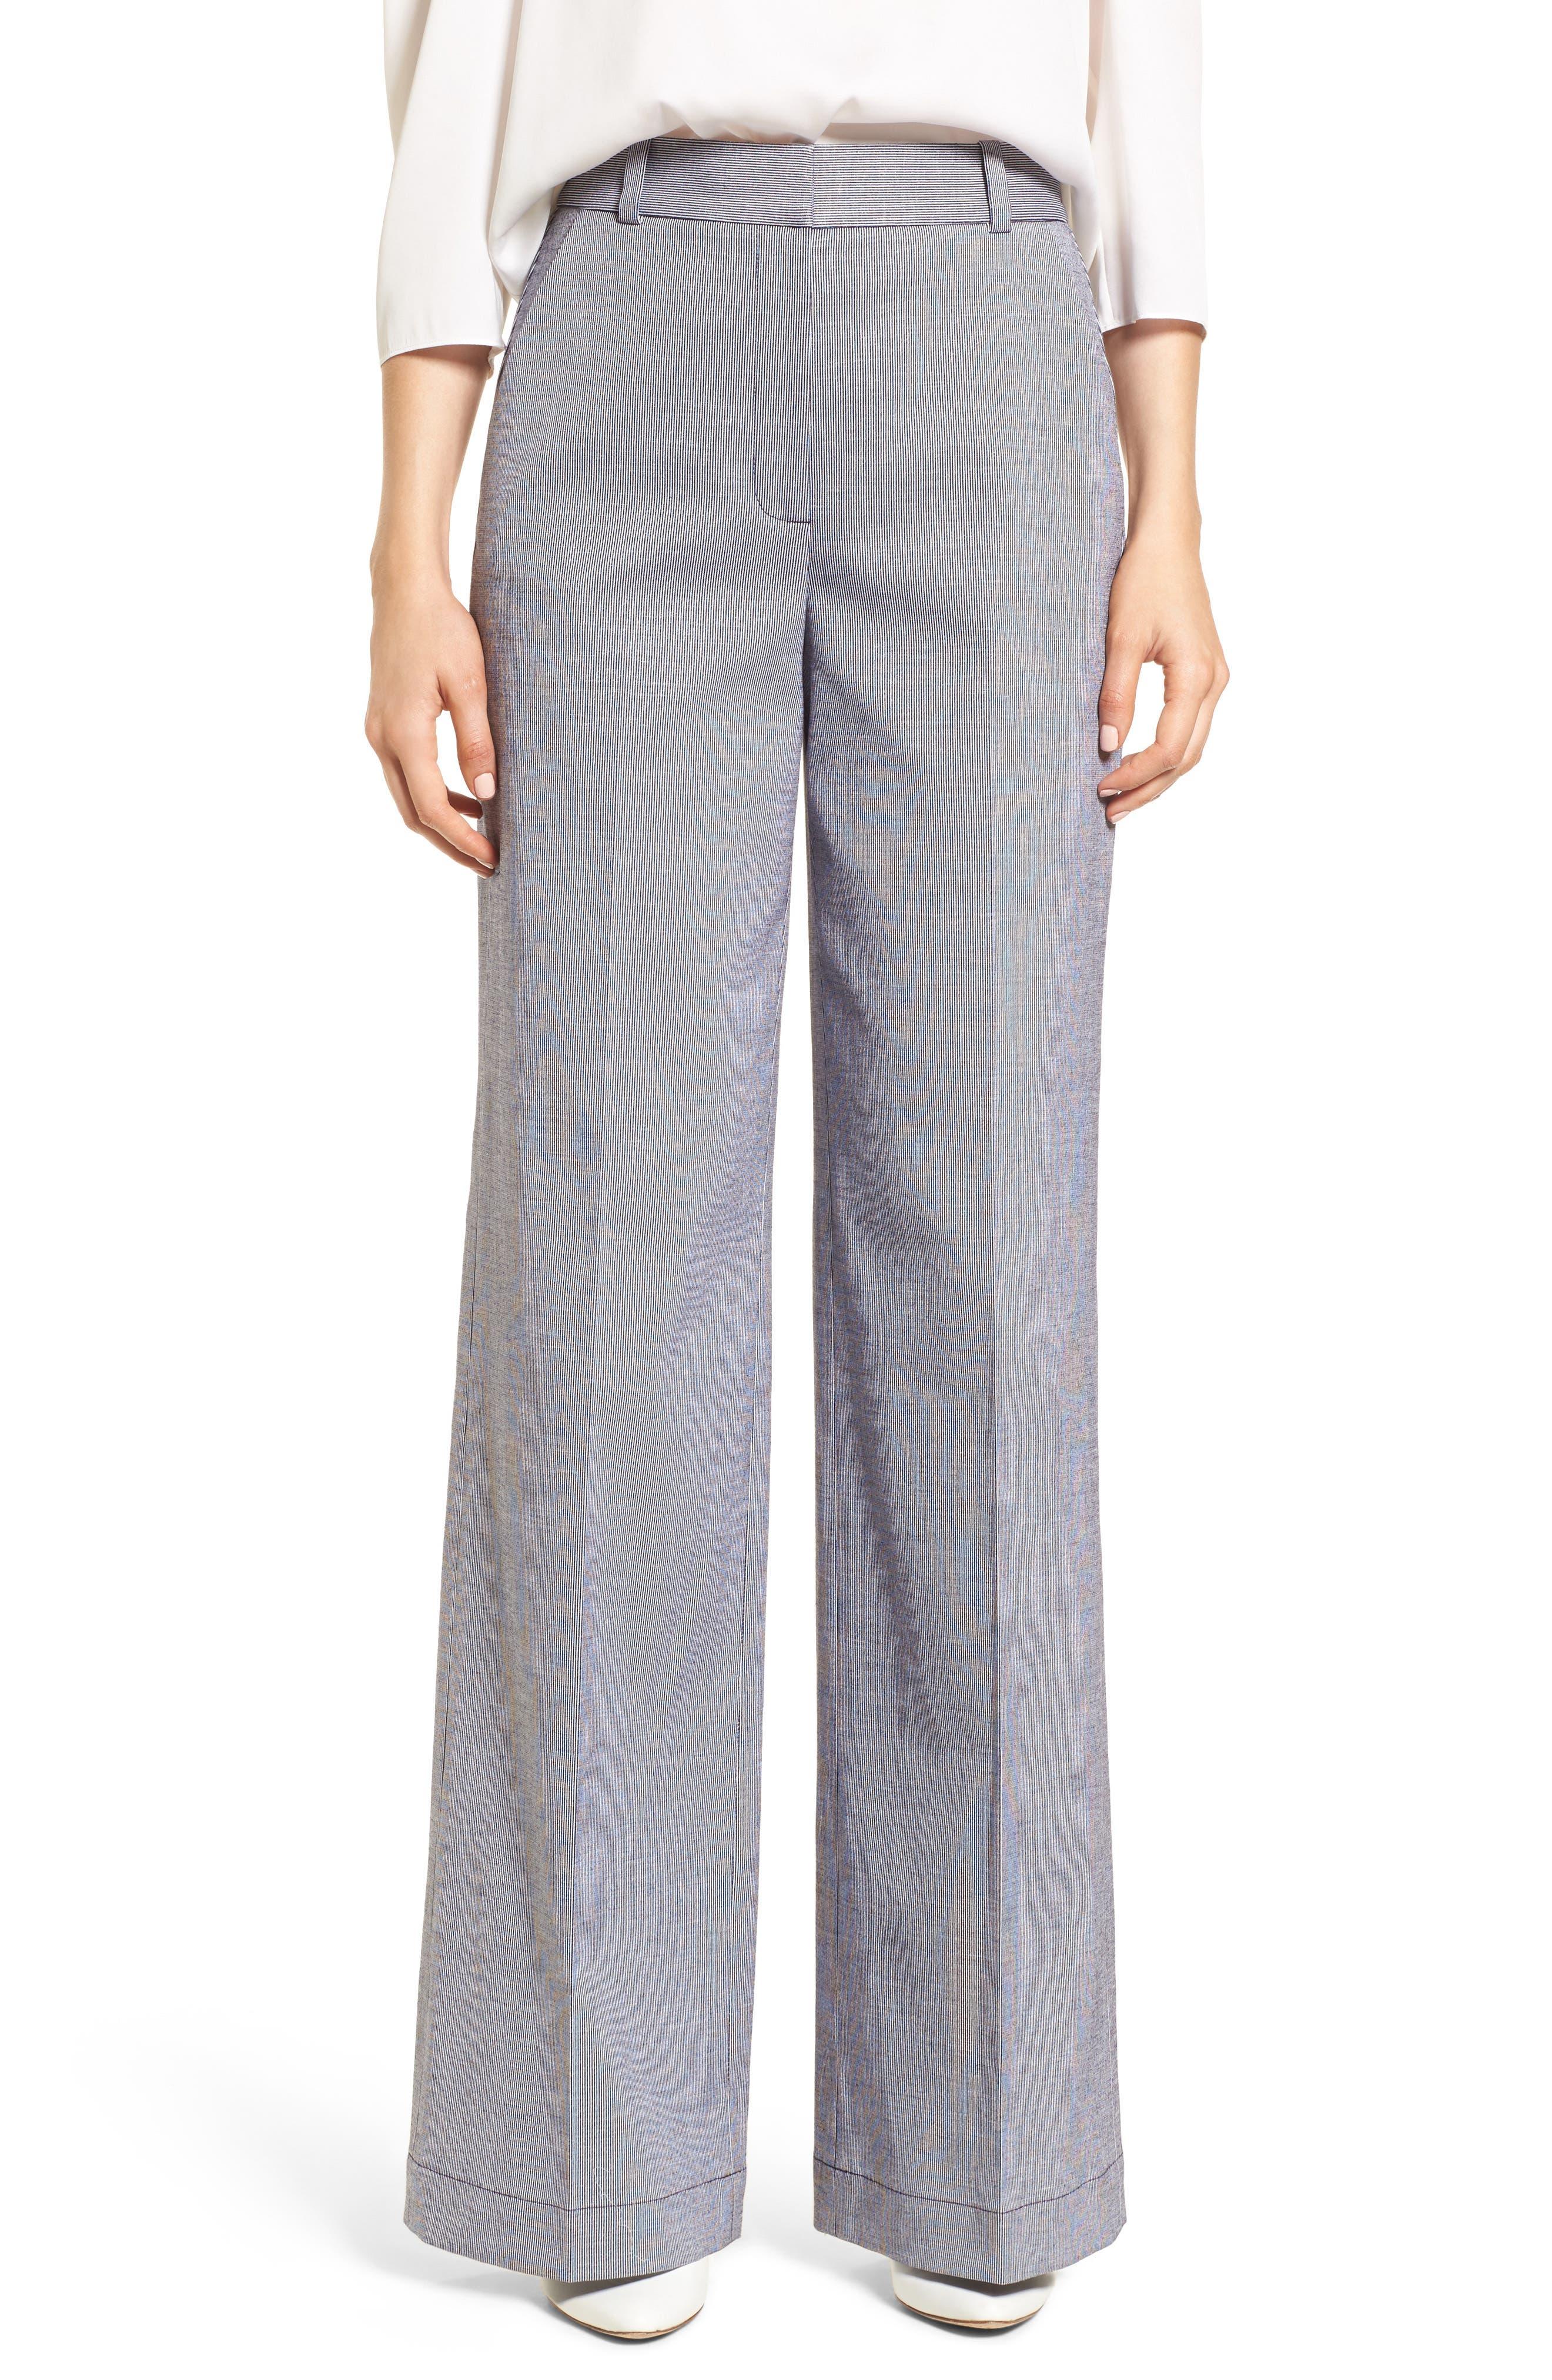 Alternate Image 1 Selected - Lewit Ticking Stripe Pants